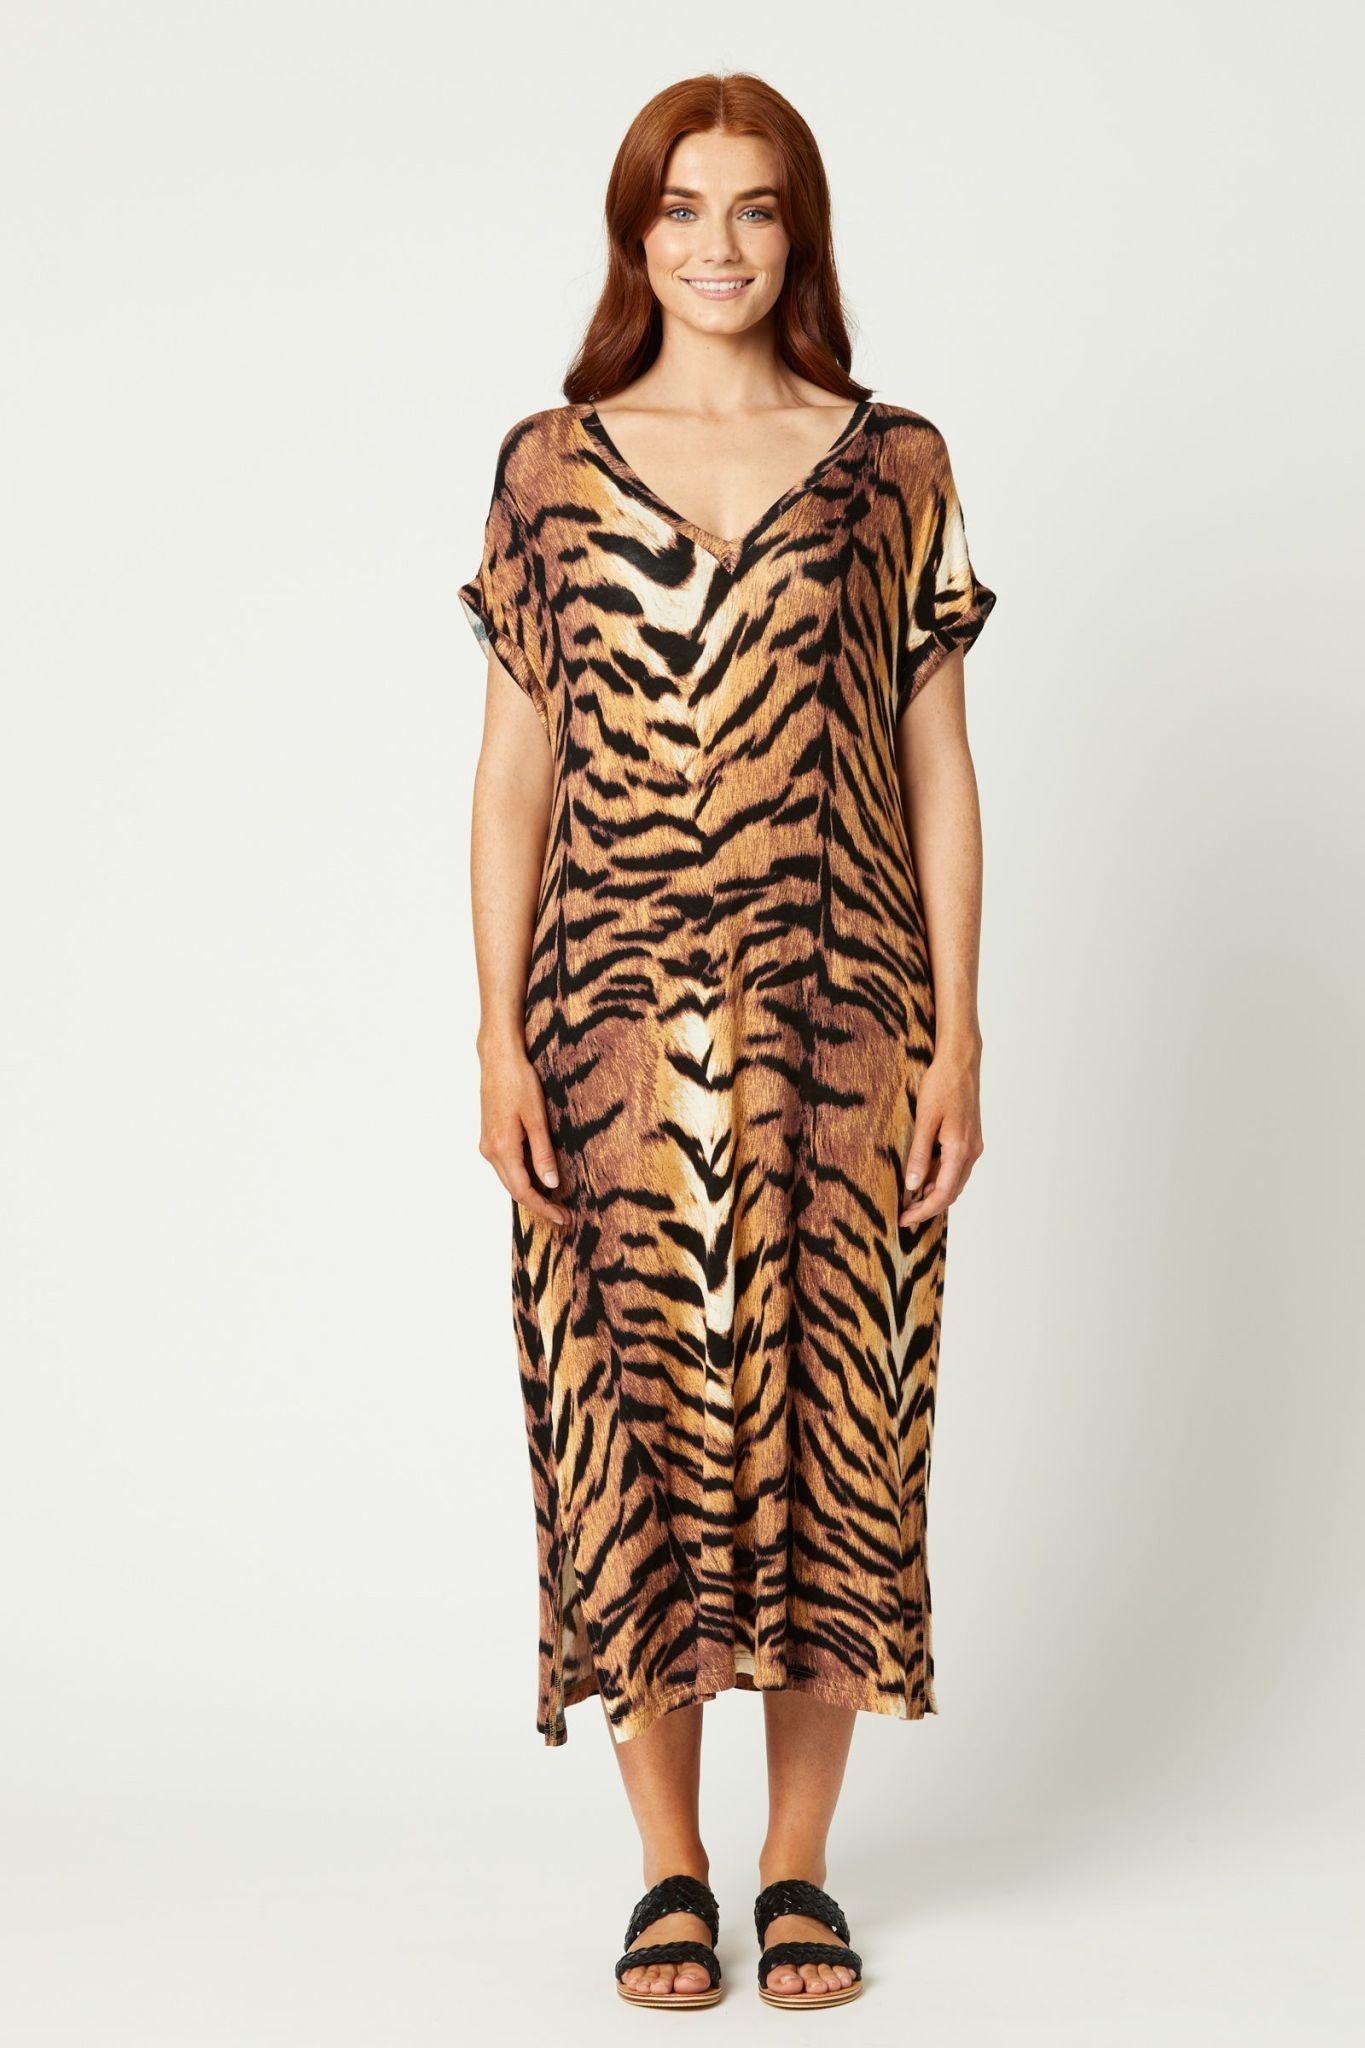 Eb & Ive Lioness Dress